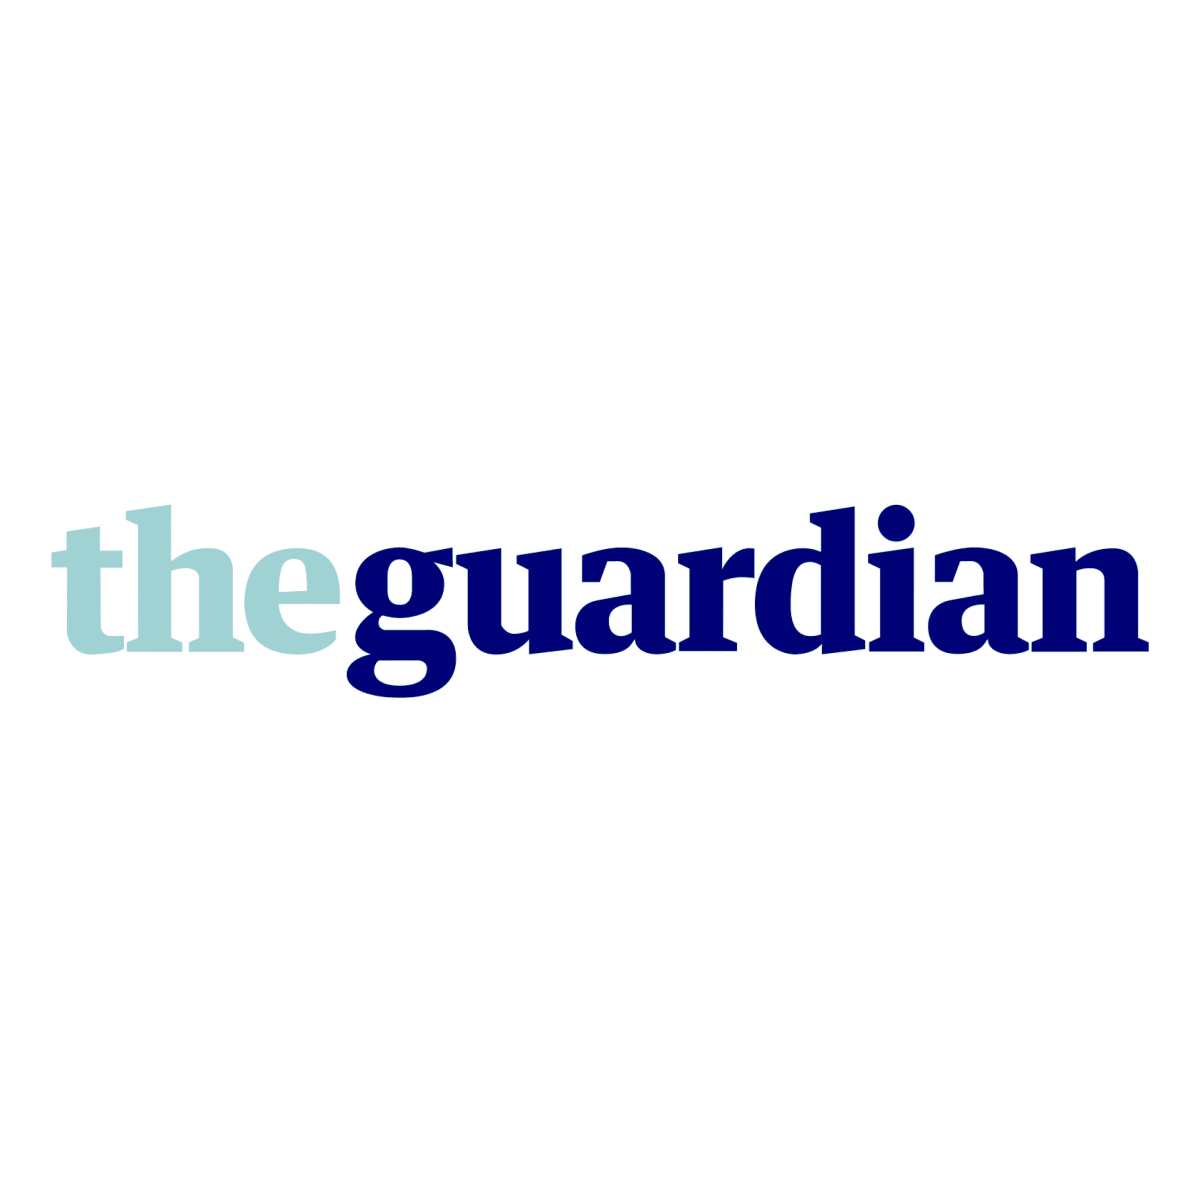 PRESS: The Guardian